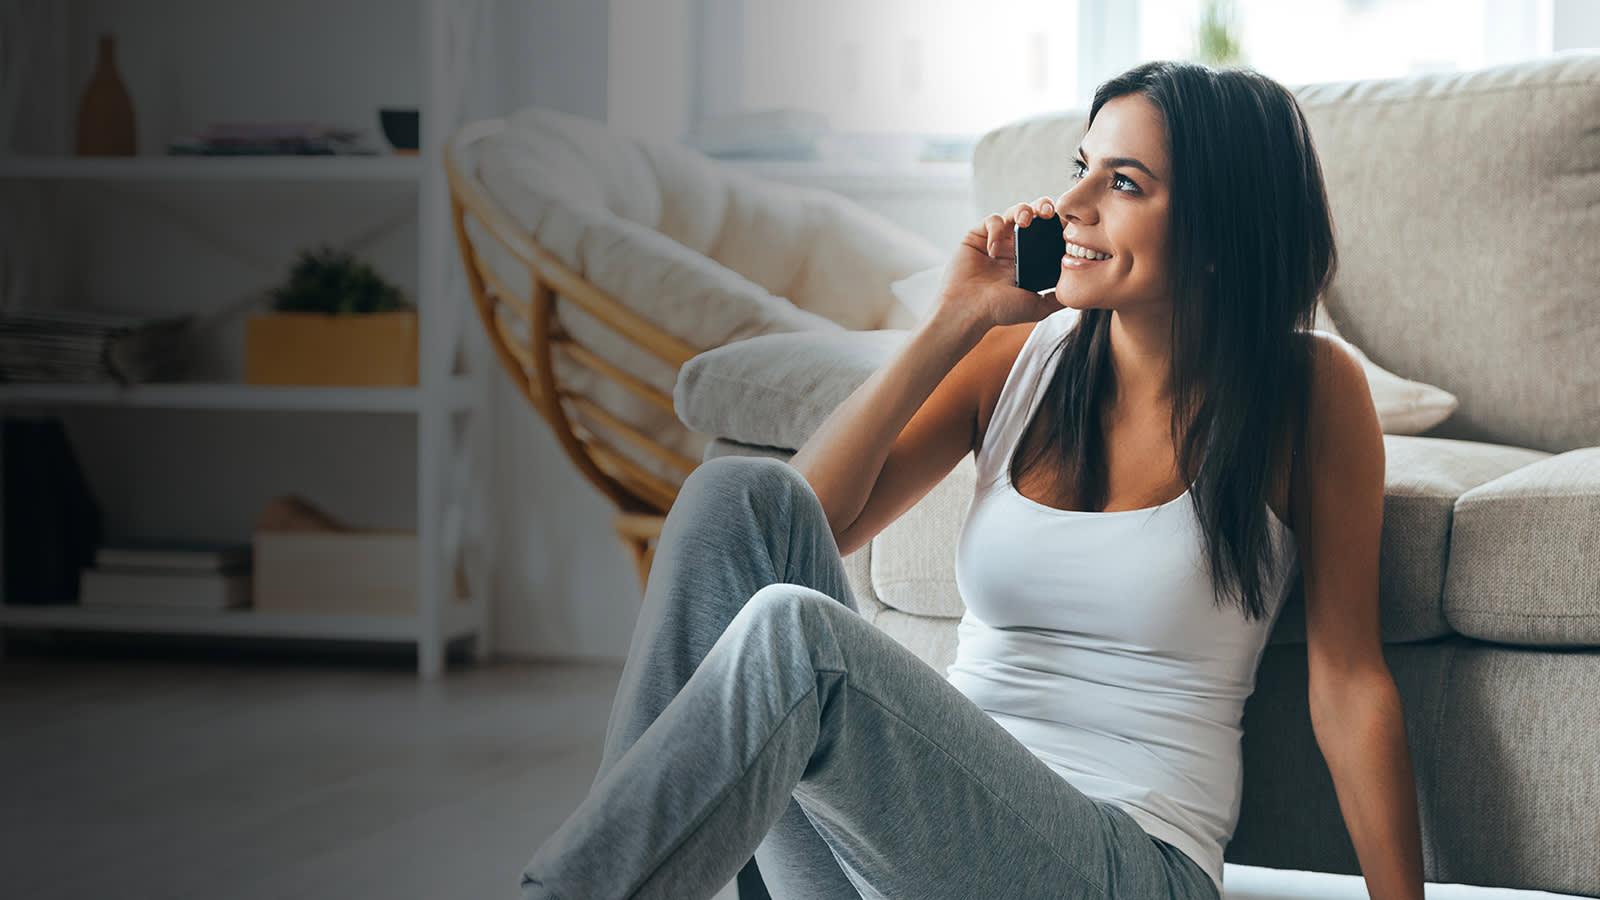 Women talking on the phone